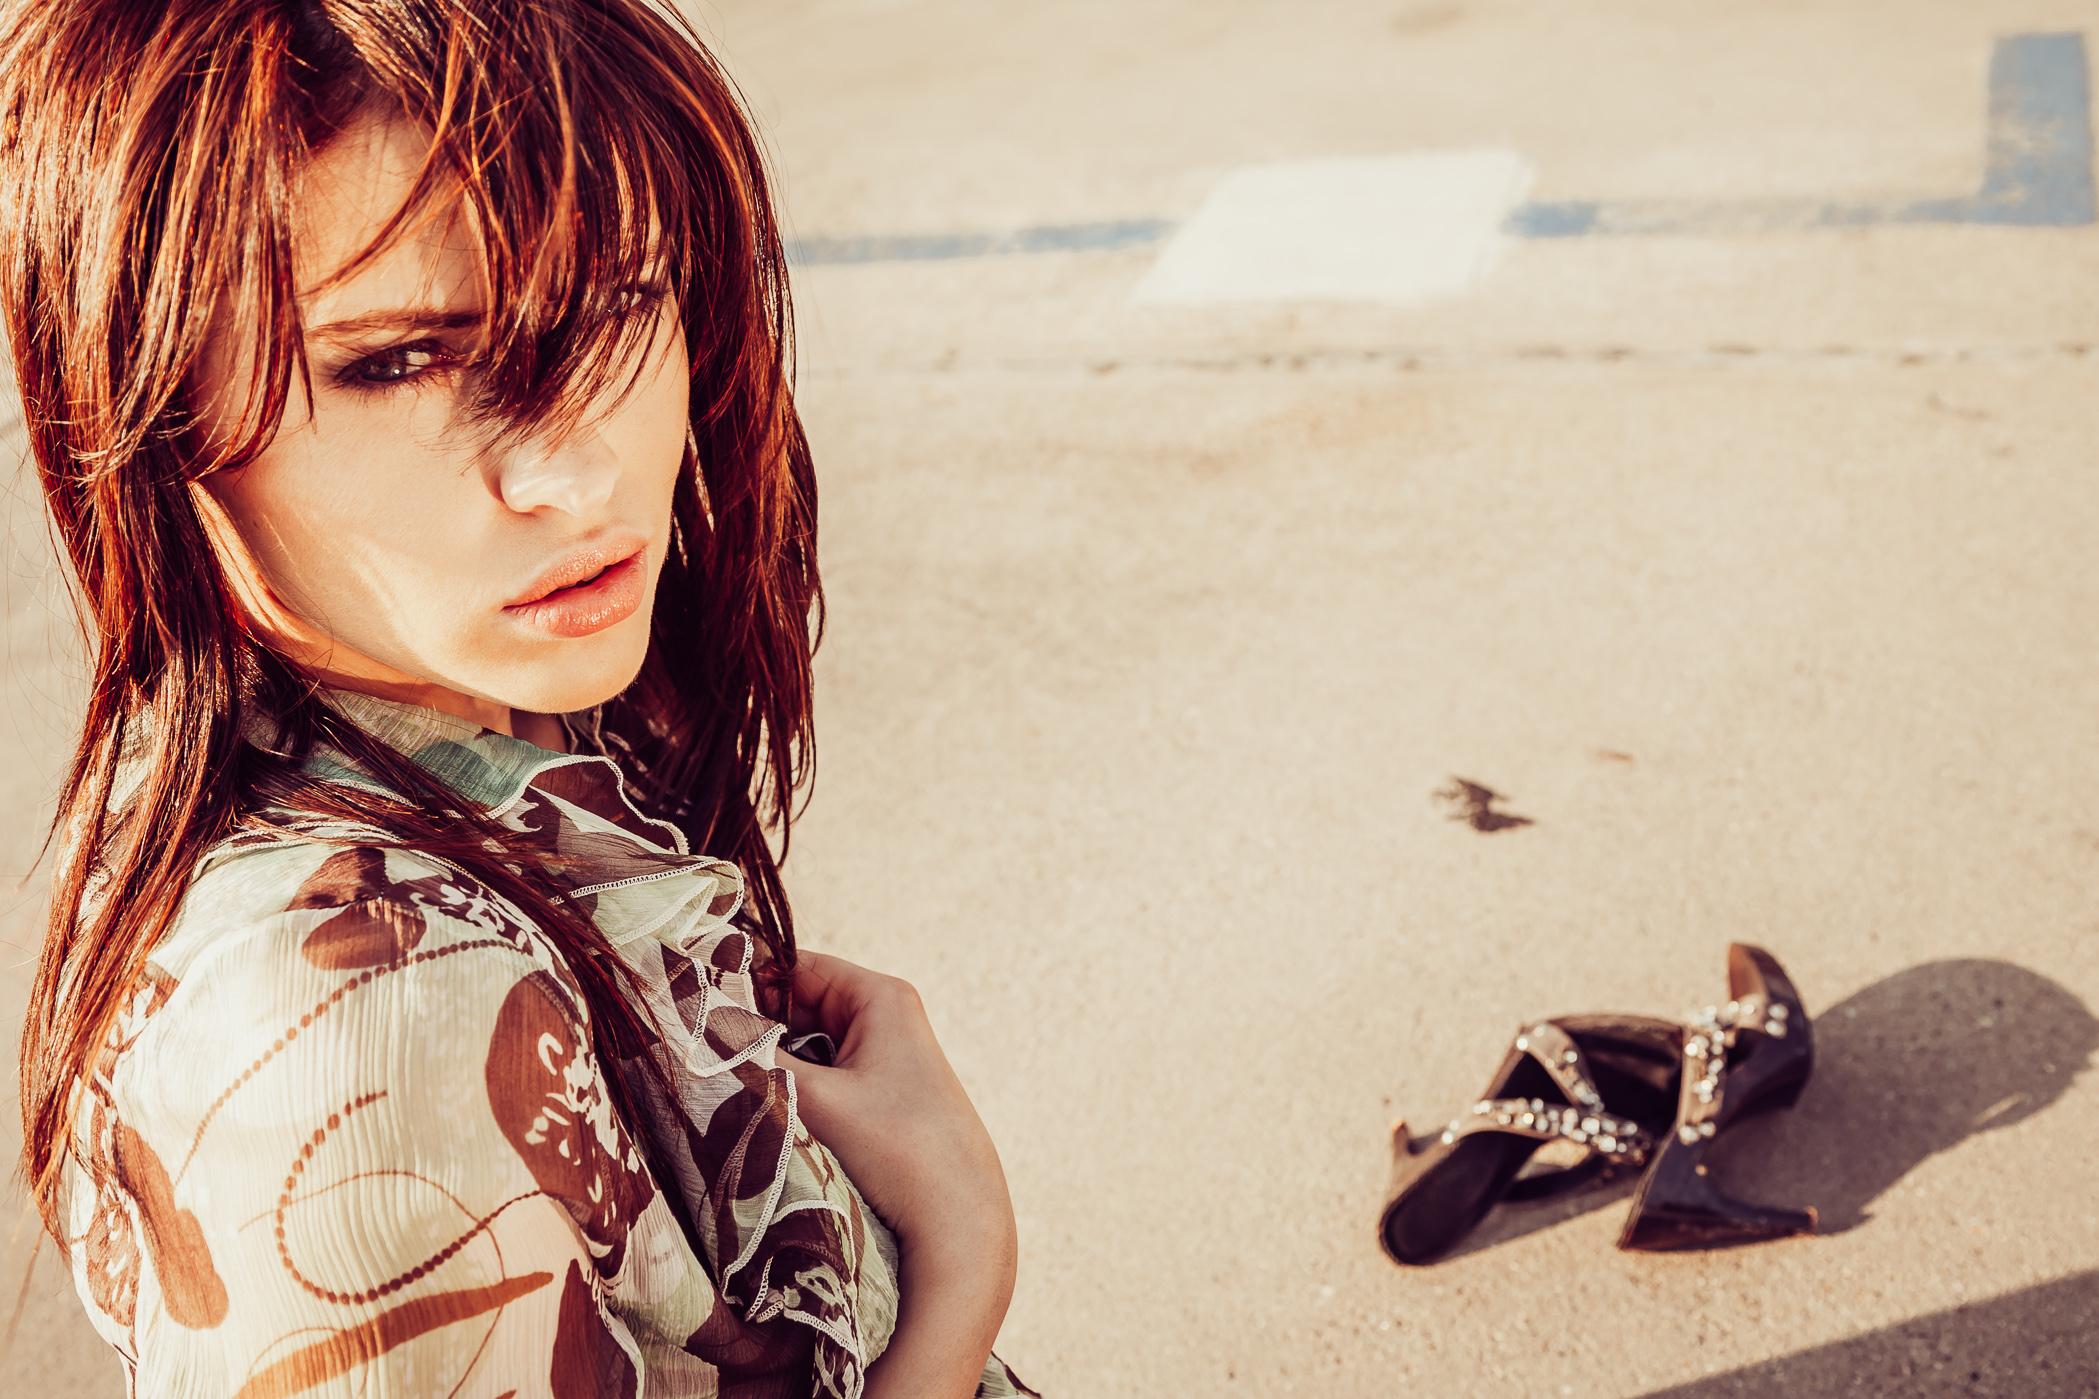 Hana Nitsche, Model, Super model, Florian Kresse, GNTM, Woman, sexy, look, portrait, photography, fashion, beauty